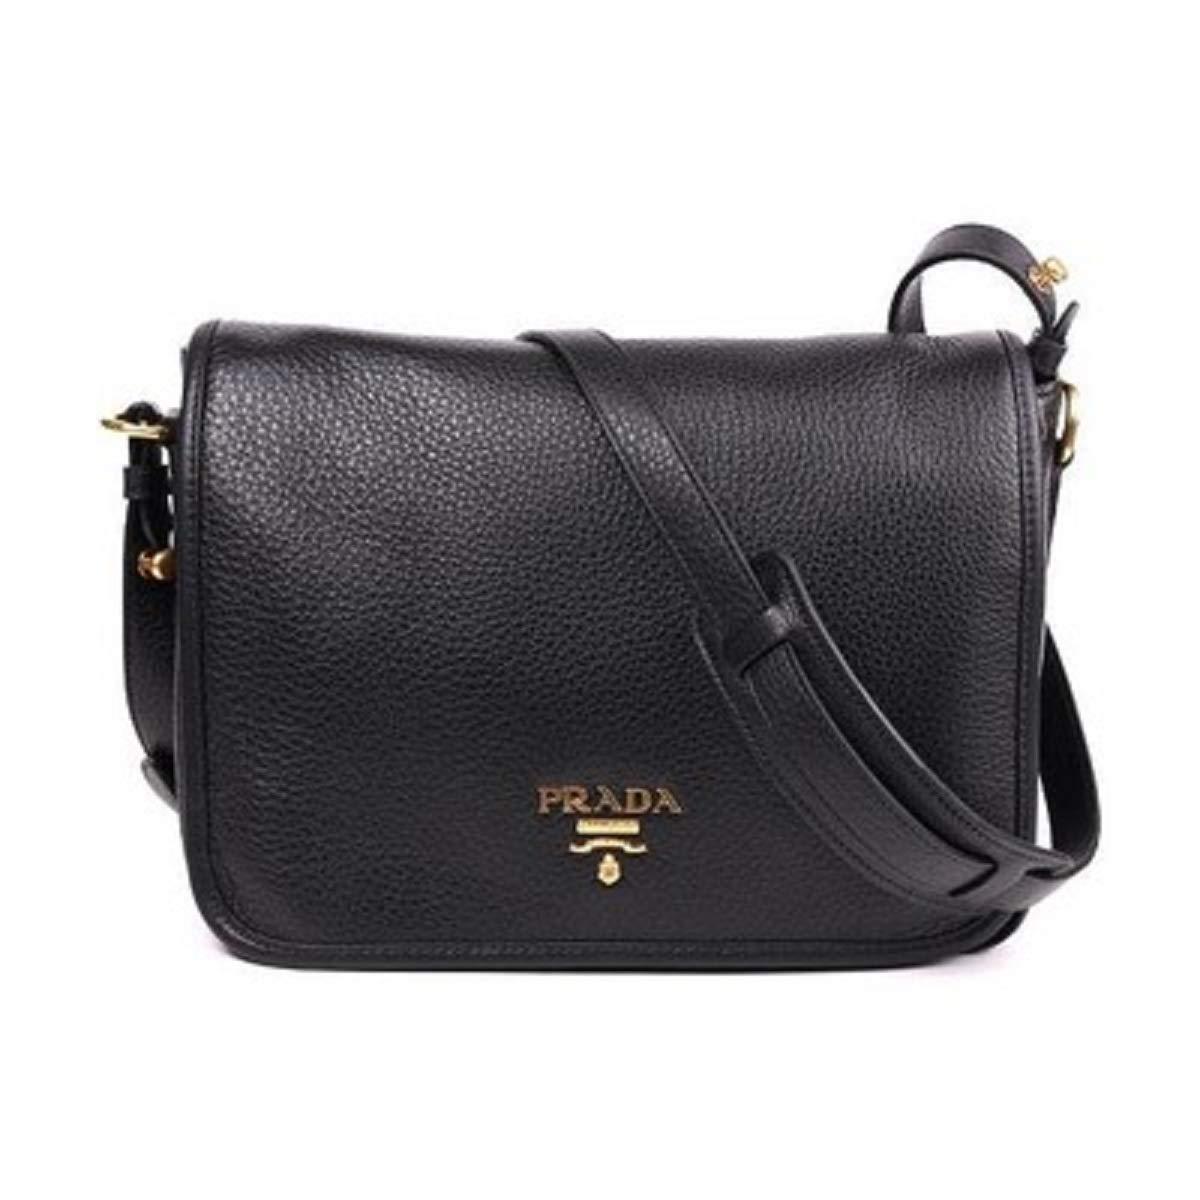 5a6b092bcbc9 Prada Vitello Phenix Nero Black Pattina Shoulder Messenger Bag 1BD091:  Handbags: Amazon.com